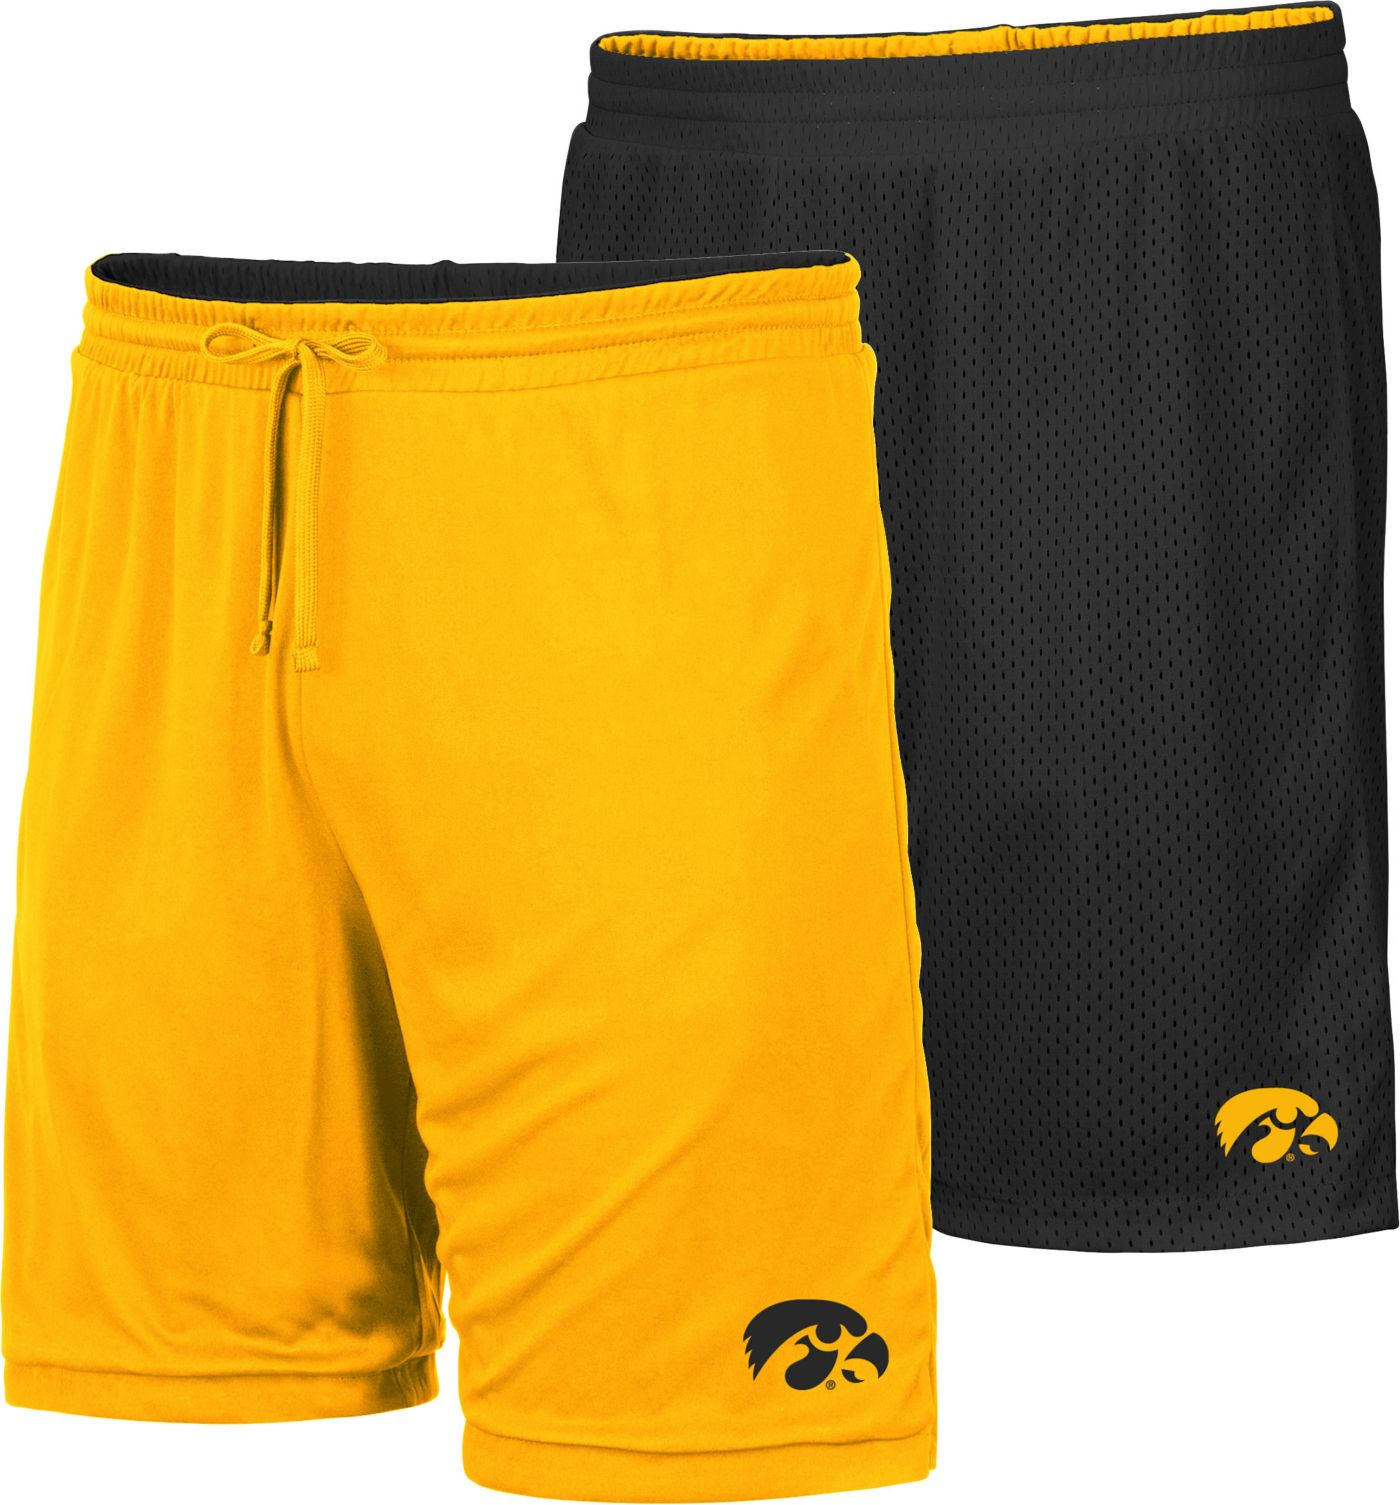 Colosseum Men's Iowa Hawkeyes Black/Gold Wiggum Reversible Shorts